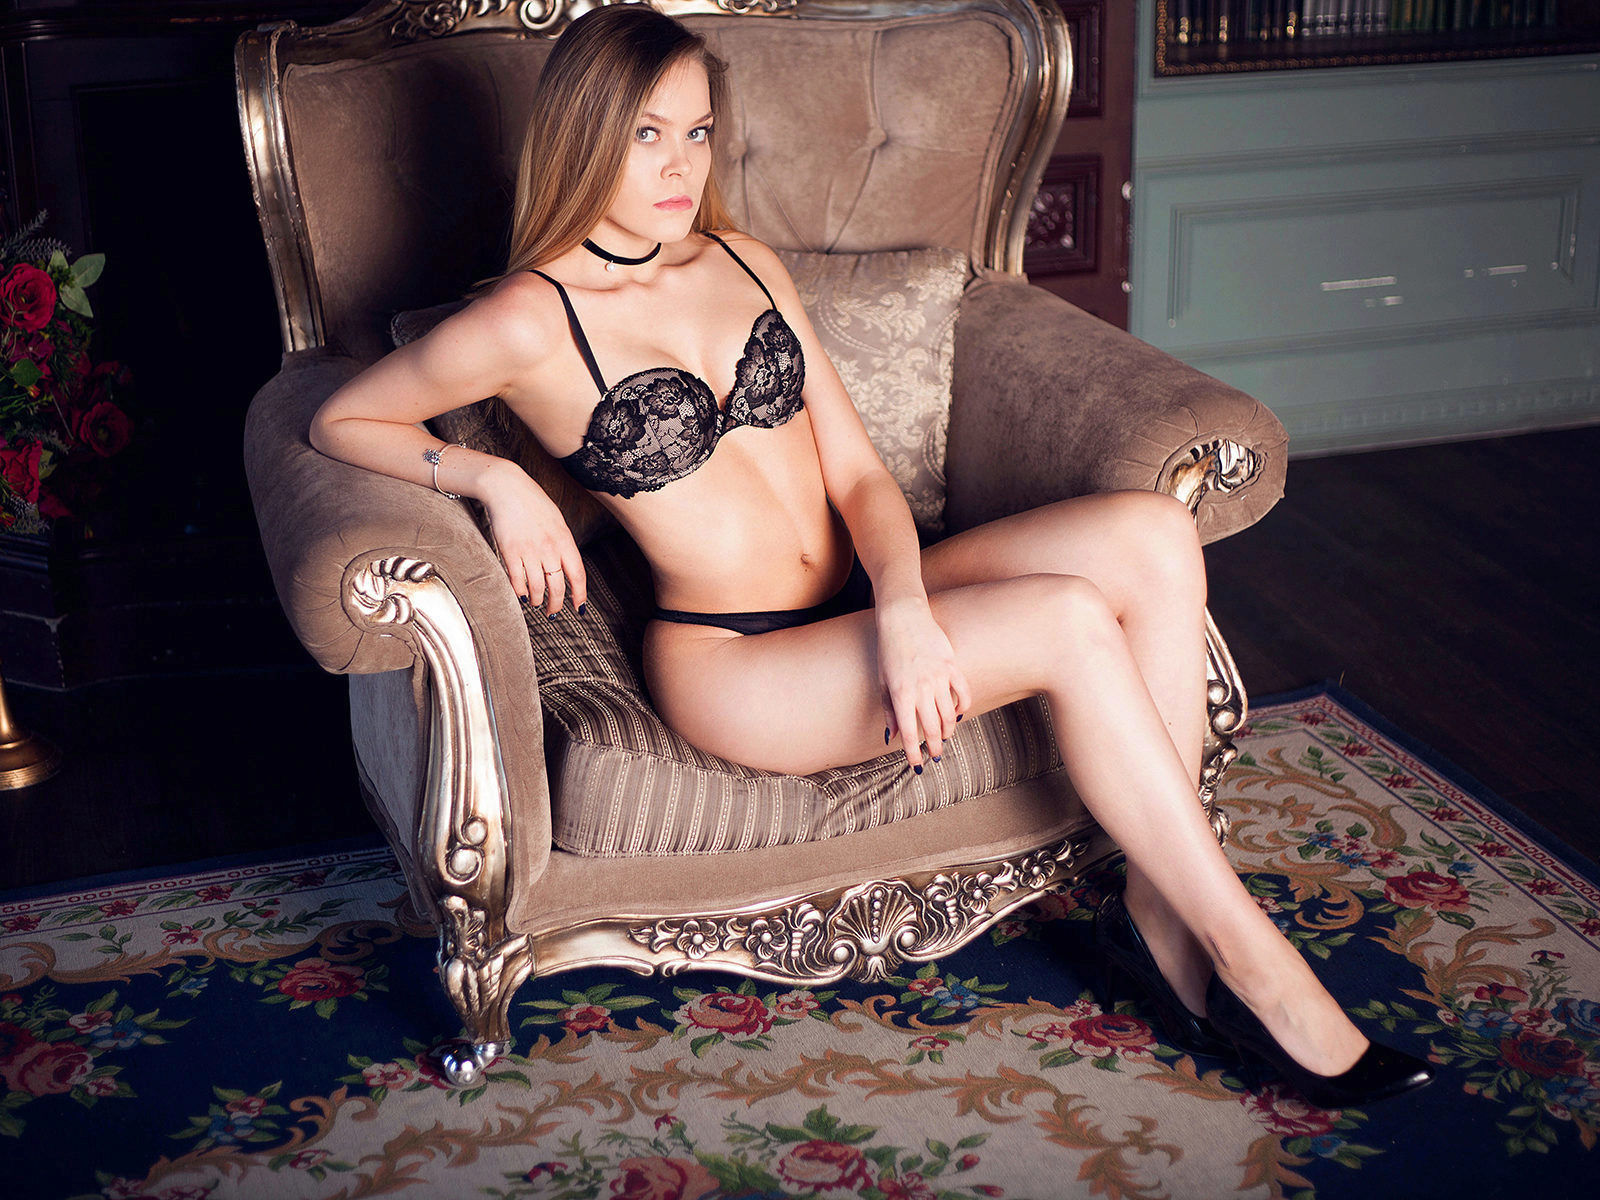 Webcam model Nicole Sun from WebPowerCam